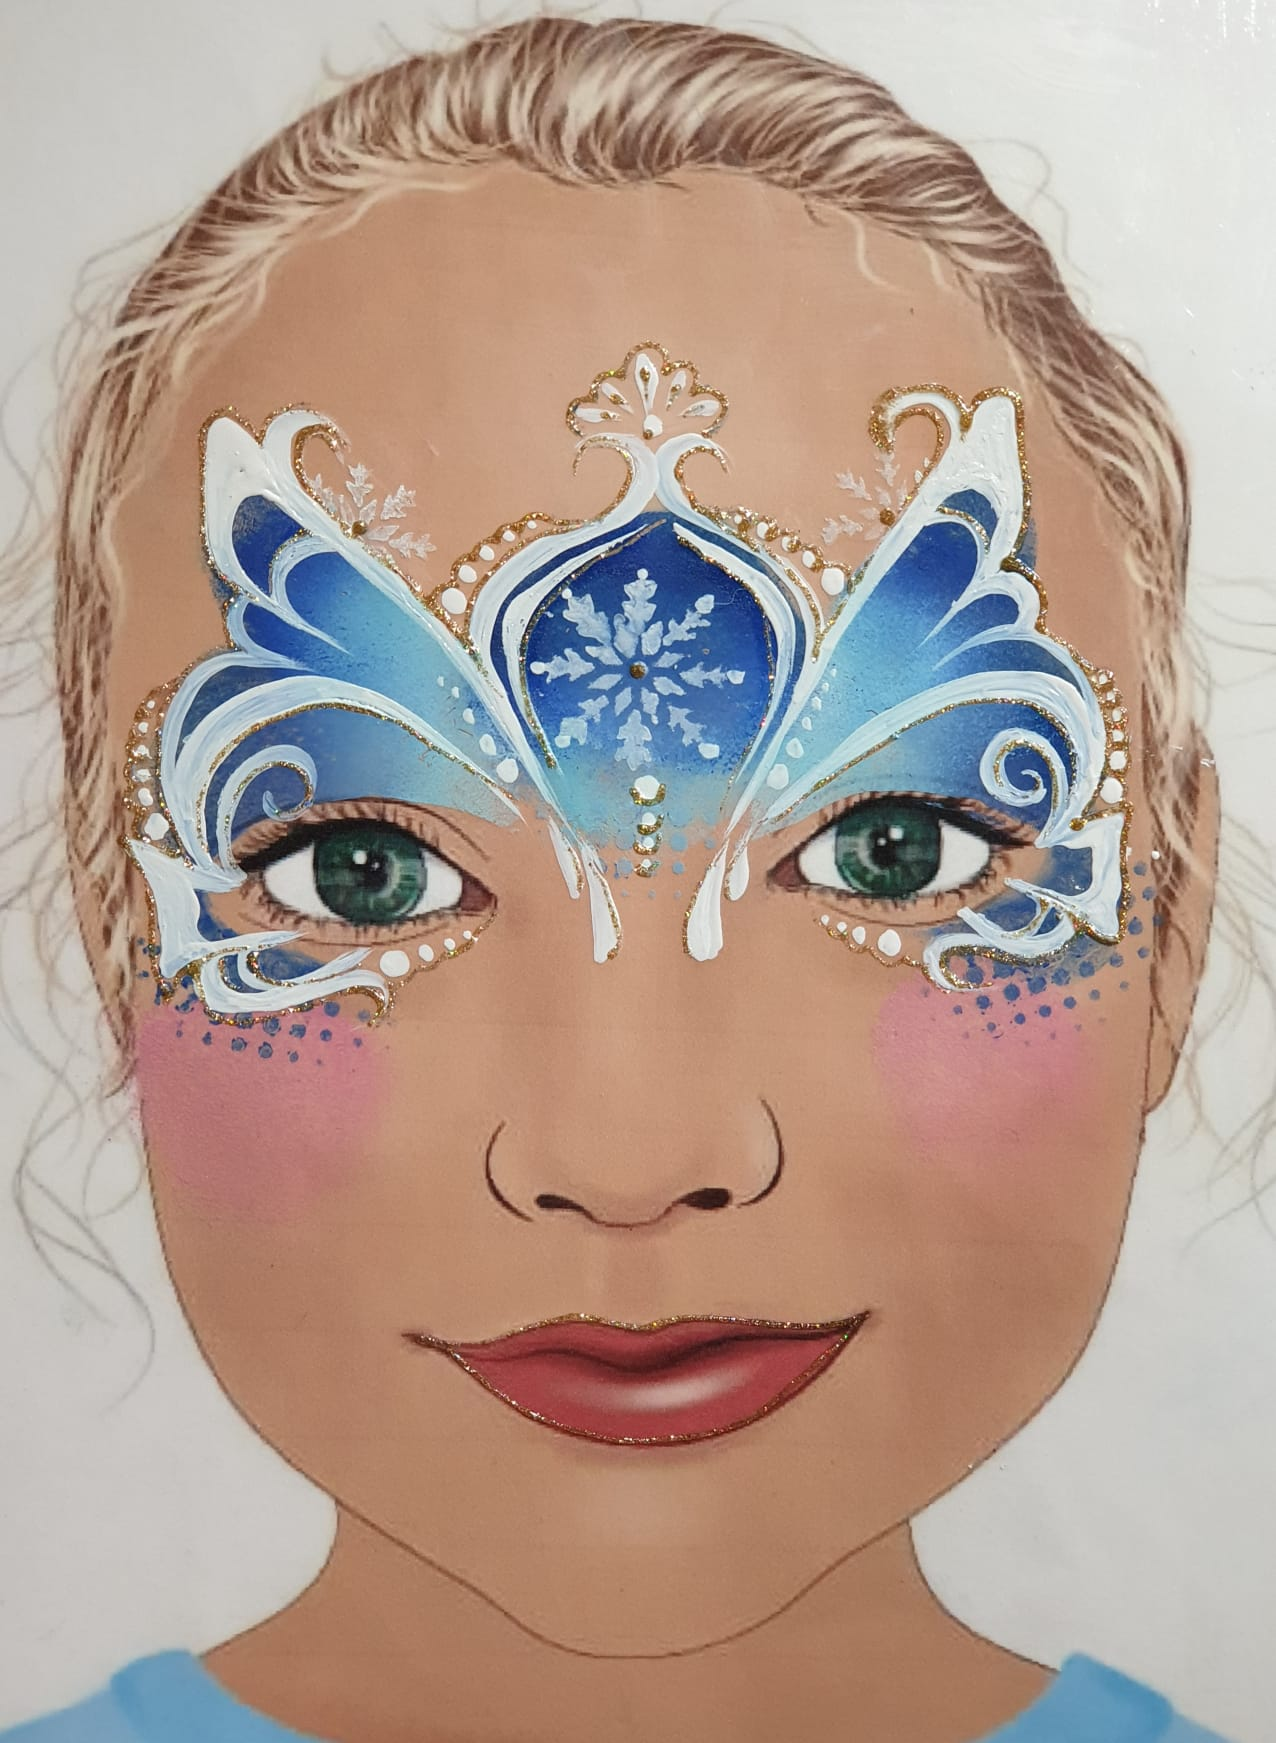 Maquillage fille professionnel fée reine de neige